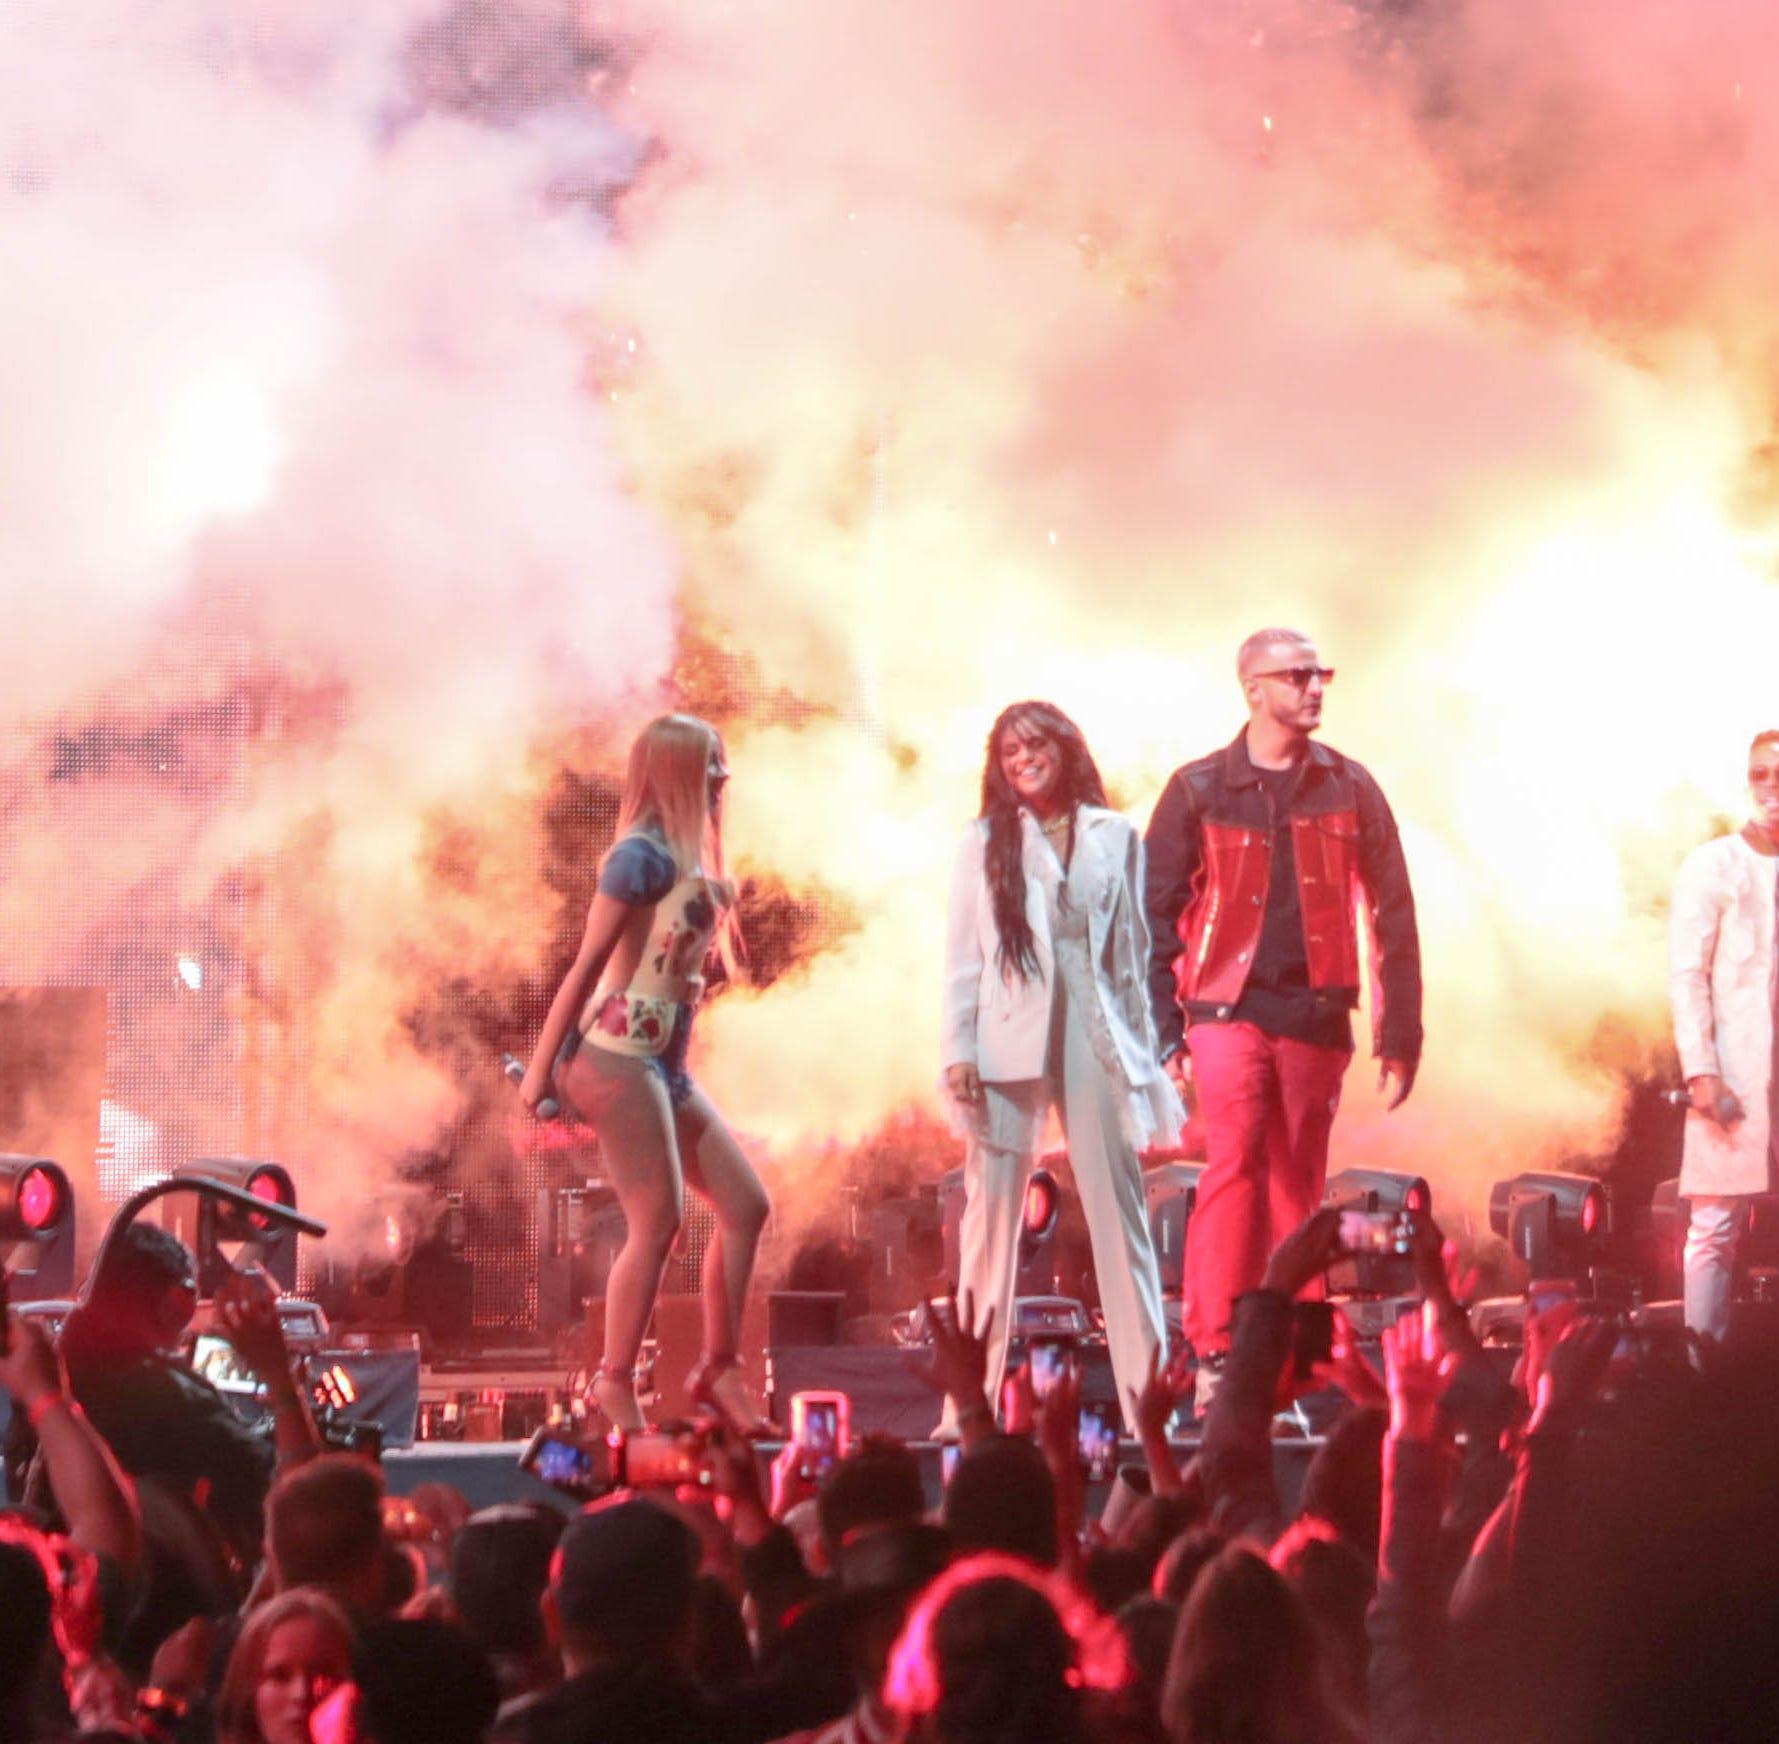 Coachella 2019: DJ Snake brings out Cardi B, Selena Gomez and Ozuna to perform 'Taki Taki'